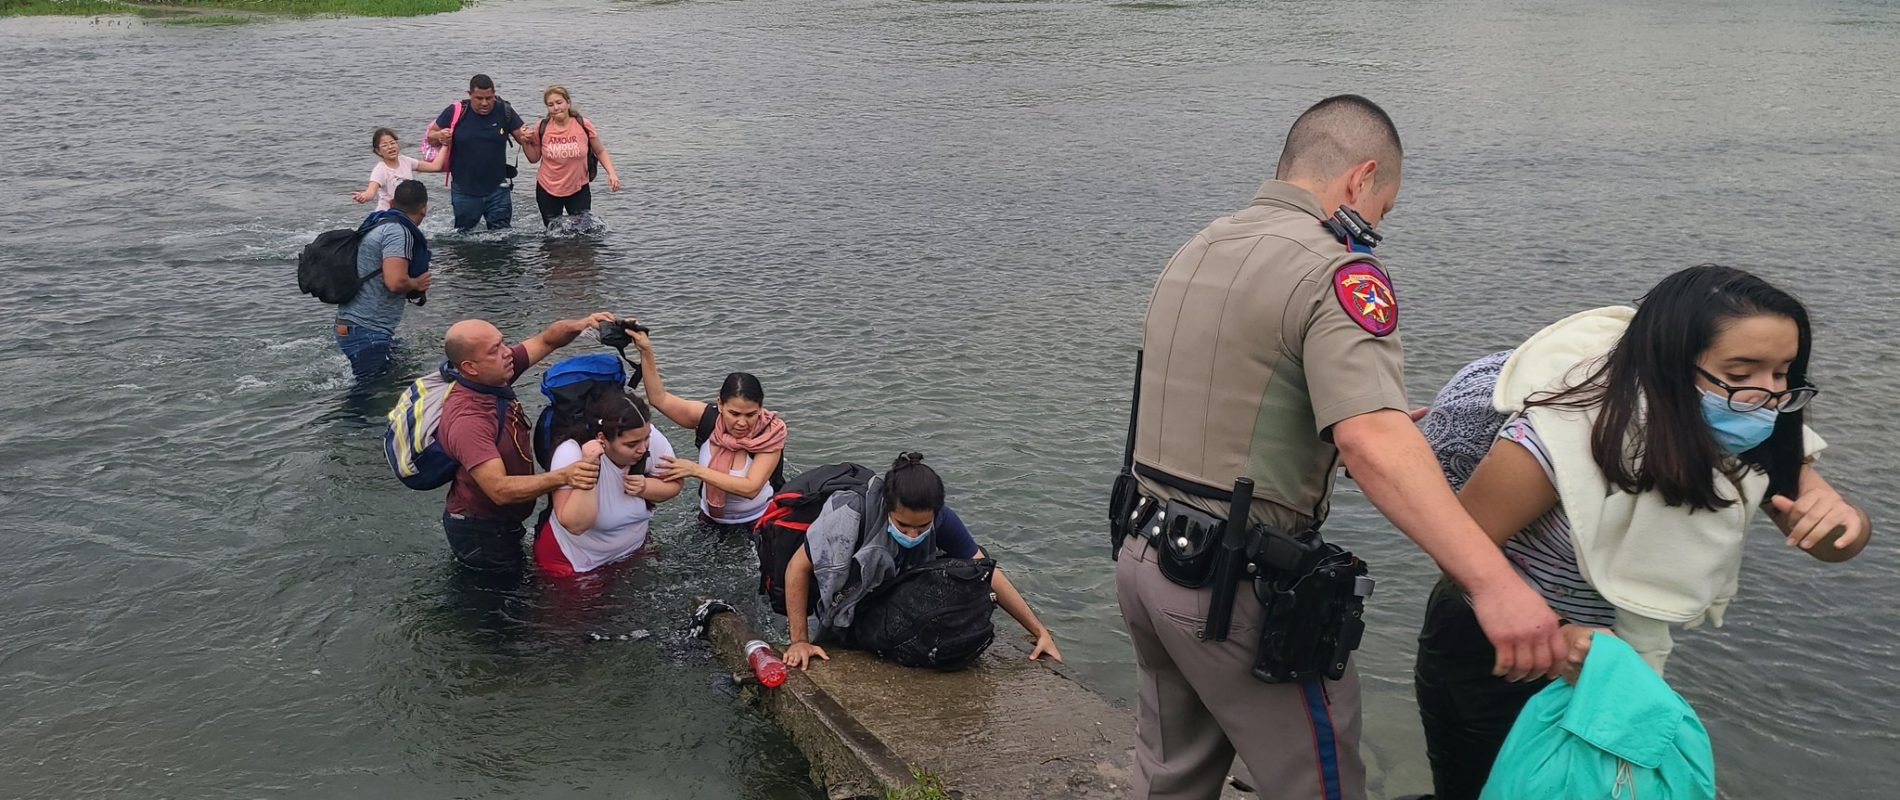 Migrantes cruzan frontera de México y EU para comprar víveres; después vuelven a Estados Unidos